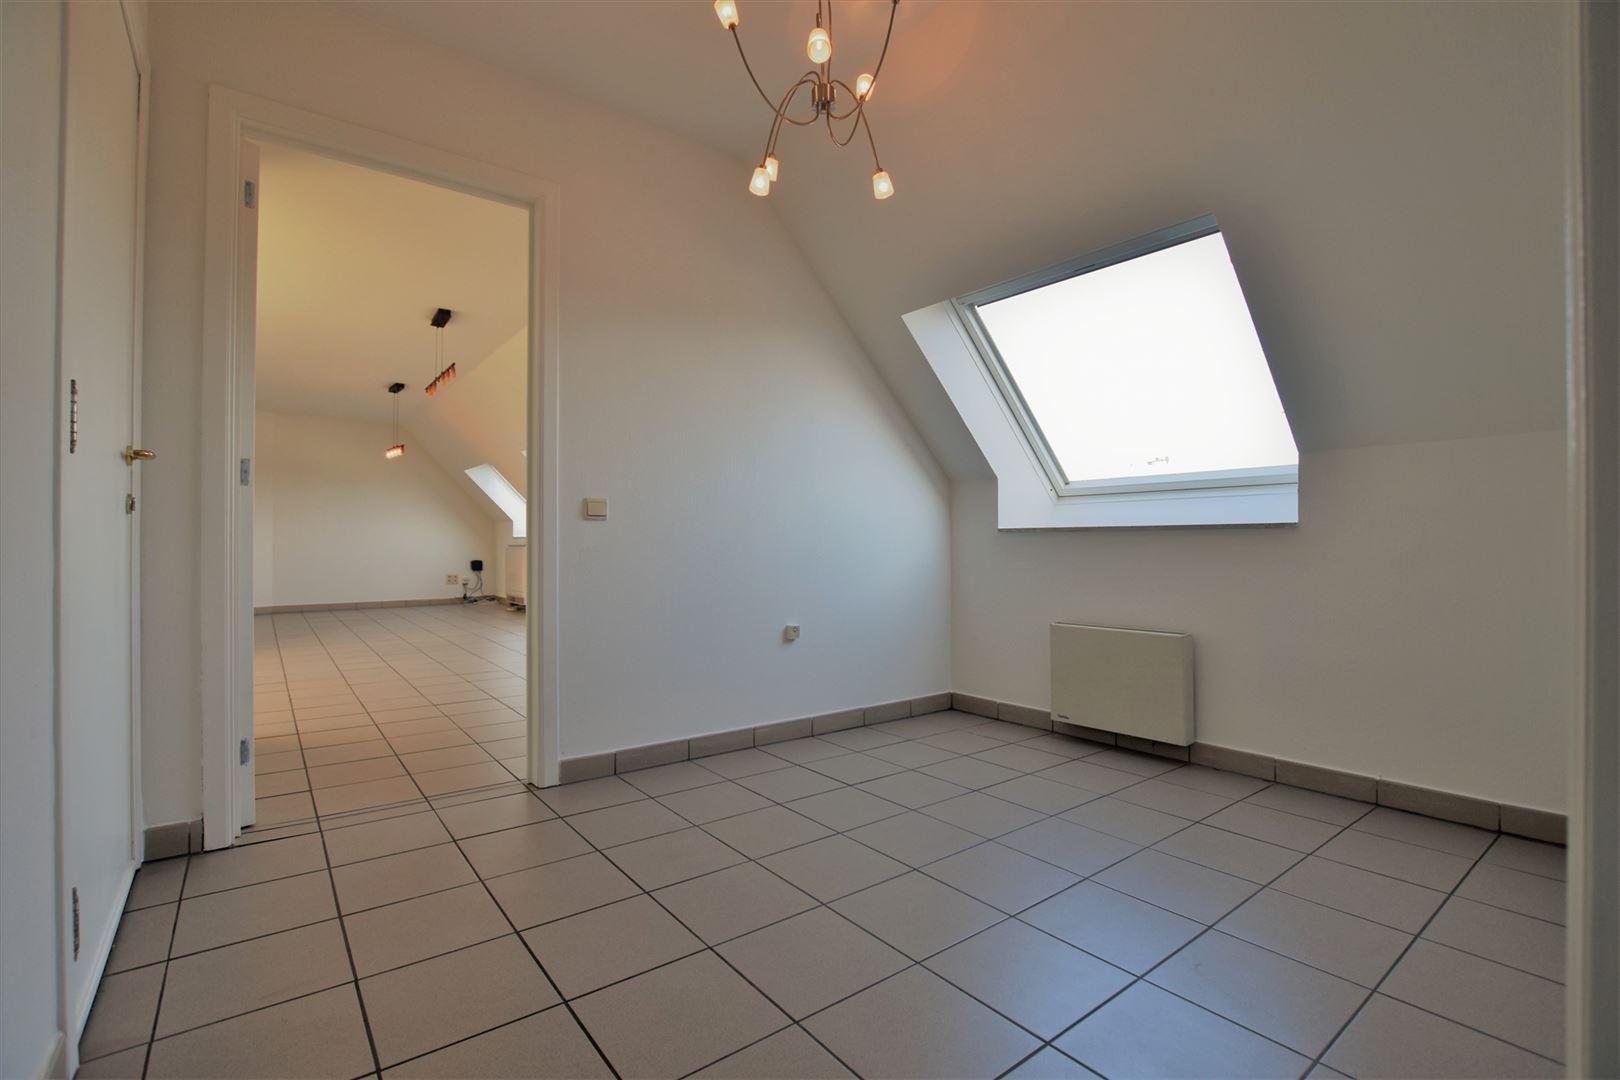 Foto 18 : Appartement te 9280 Lebbeke (België) - Prijs € 645